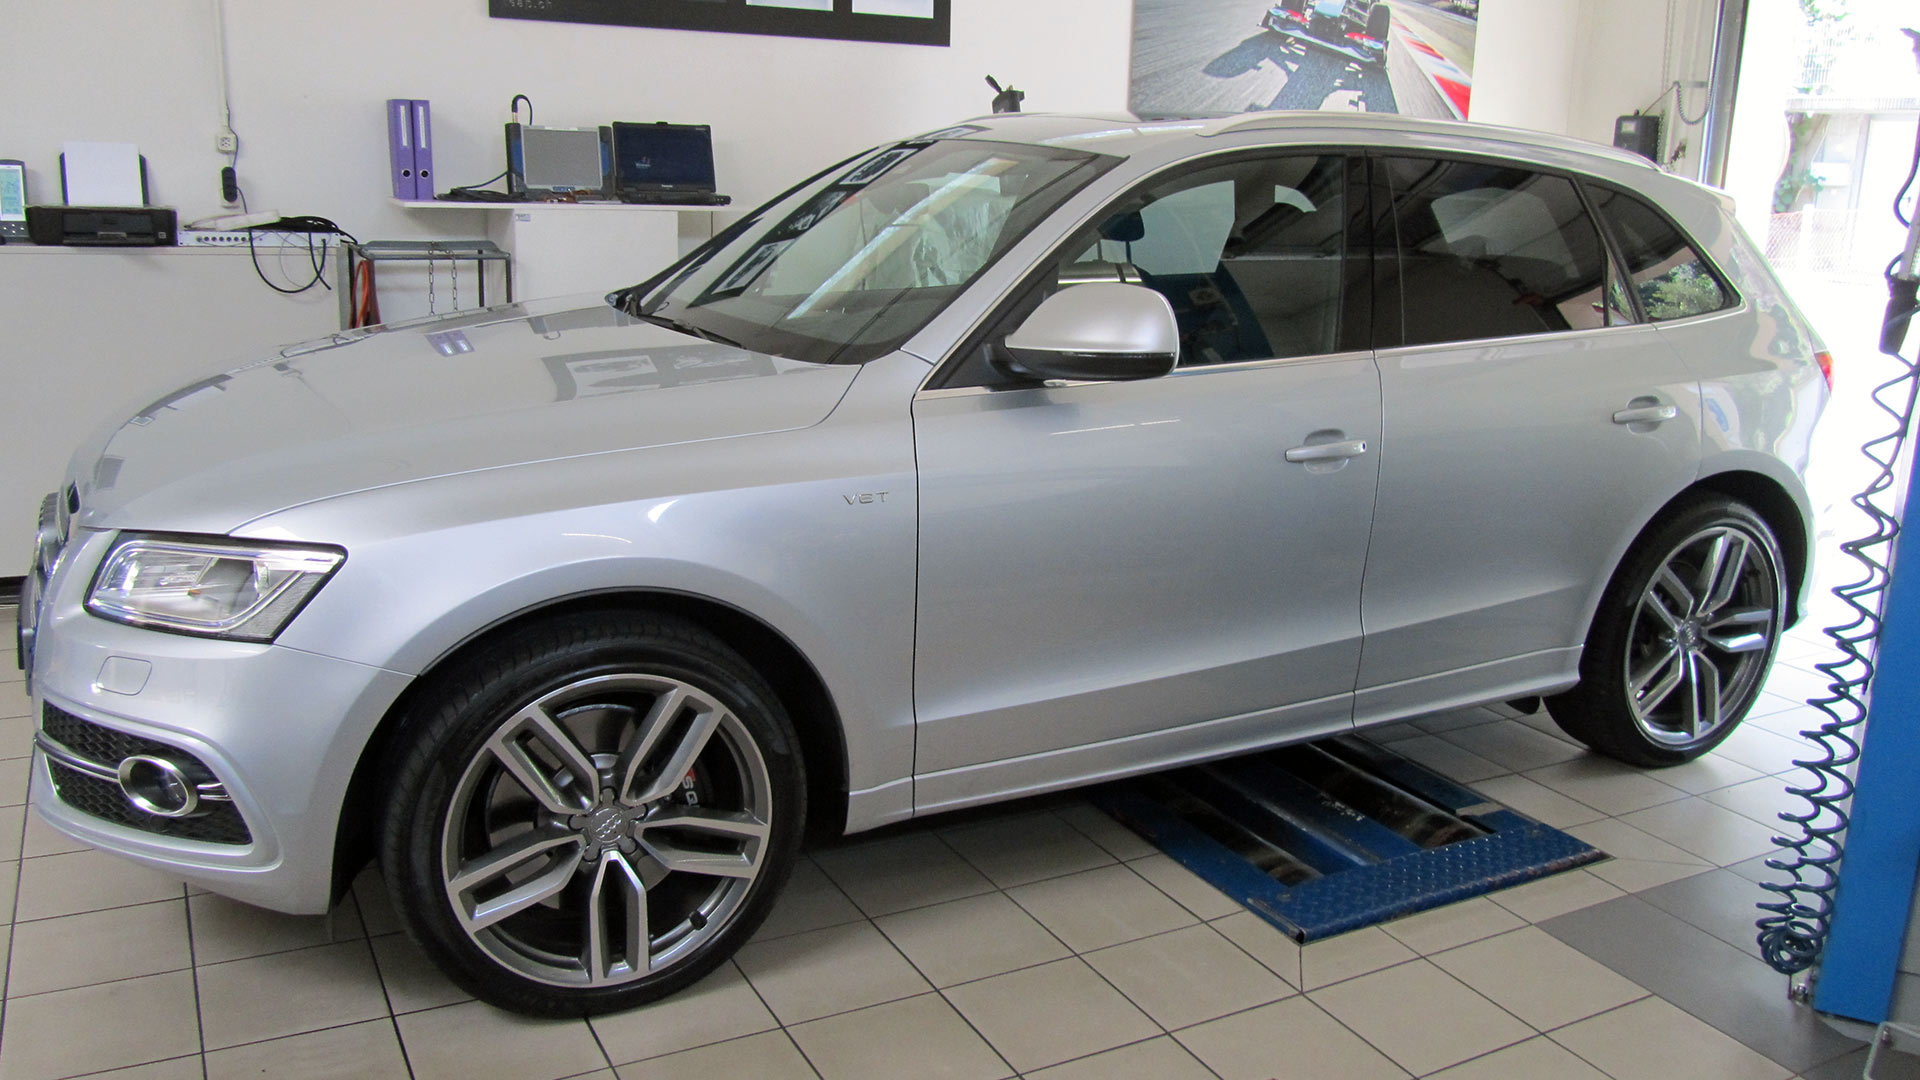 Audi SQ5 3.0lt V6 TDI, optimiert von 230KW / 313PS / 650NM auf 264KW / 360PS / 730NM